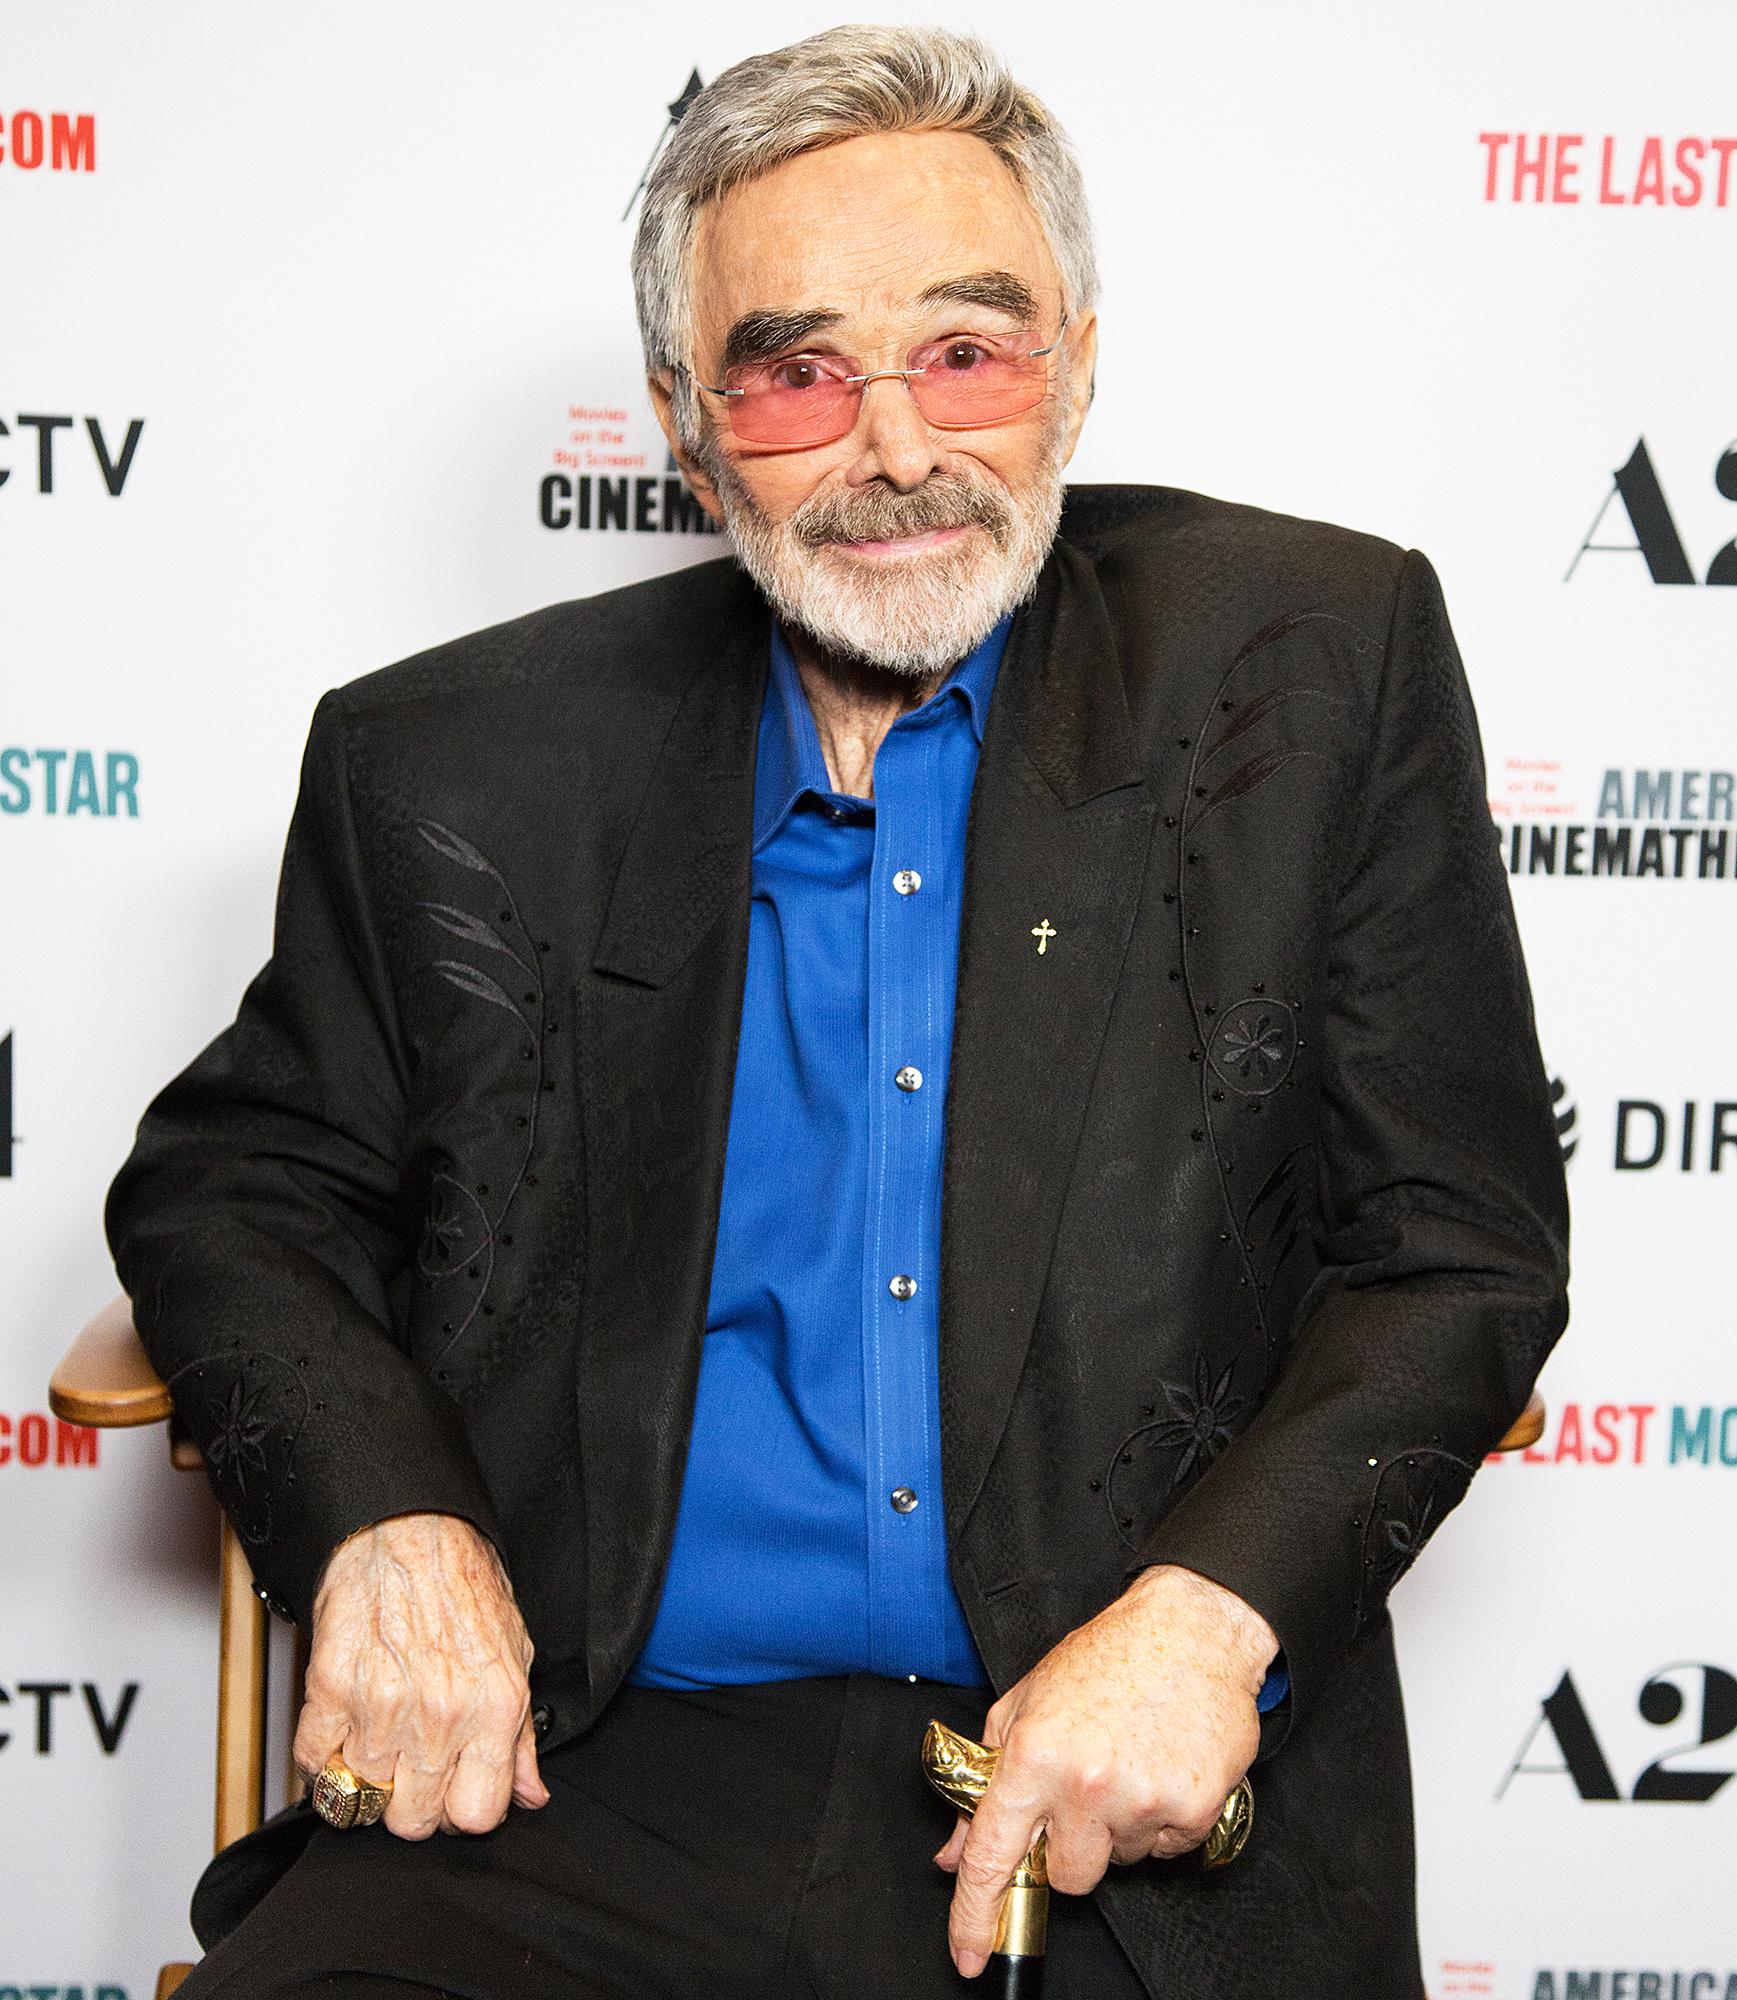 Burt Reynolds Dead Family Speaks Out